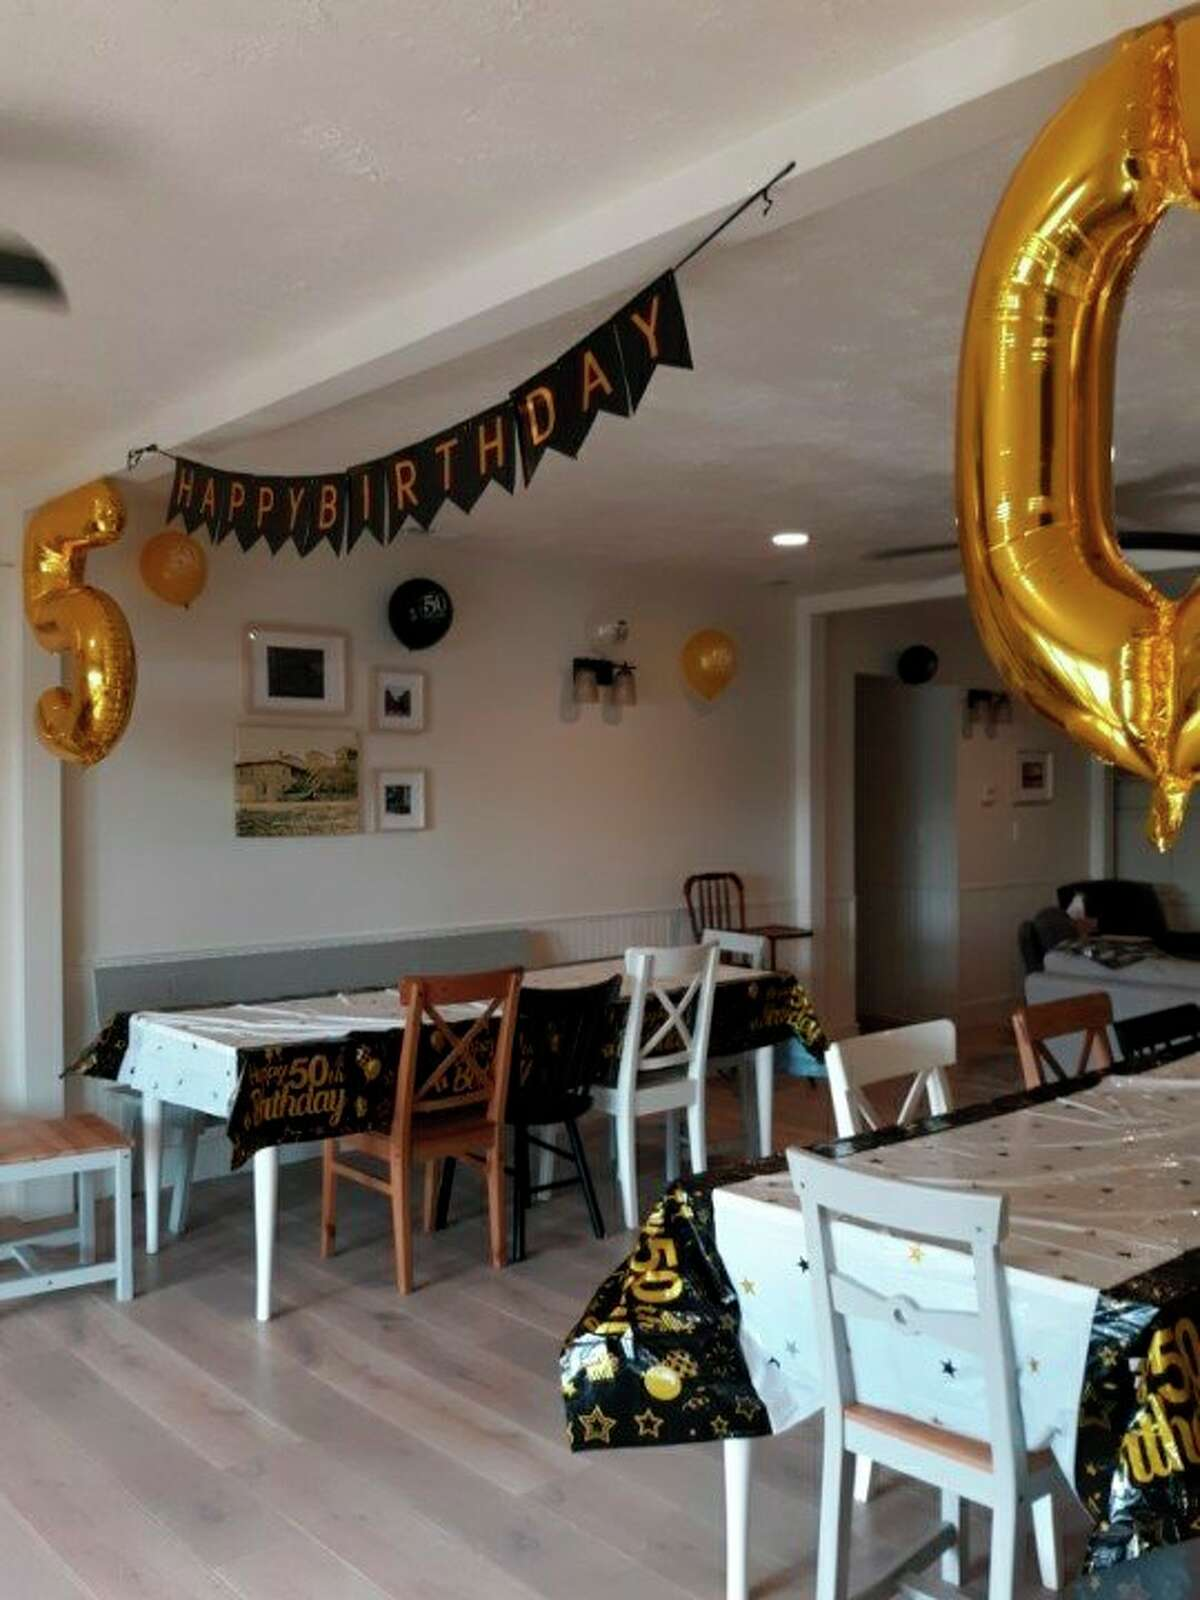 Birthday decorations for the celebration Lovina's children planned. (Courtesy photo)